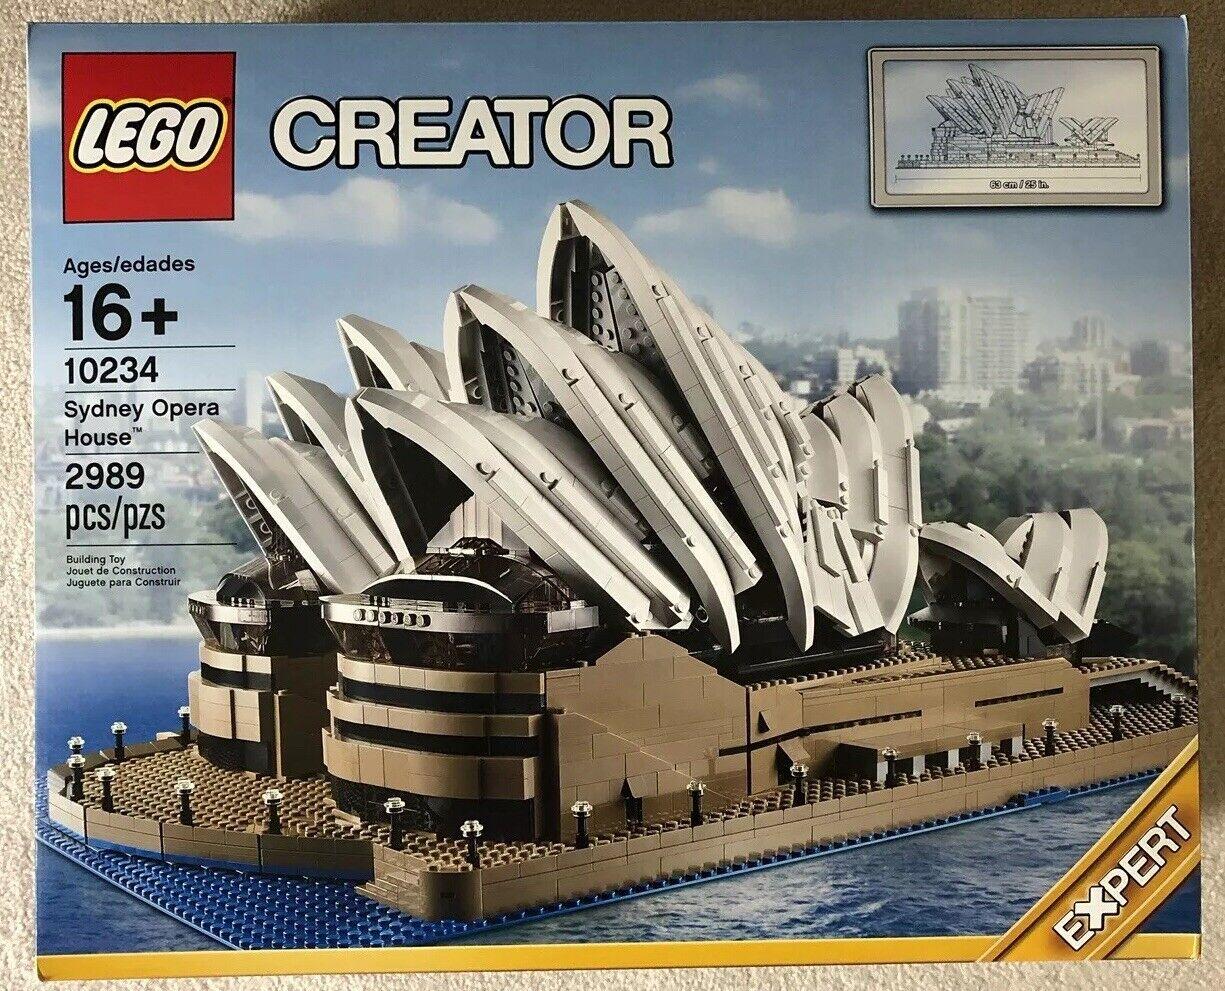 Lego Creator  Sydney Opera House 10234  ordina ora con grande sconto e consegna gratuita